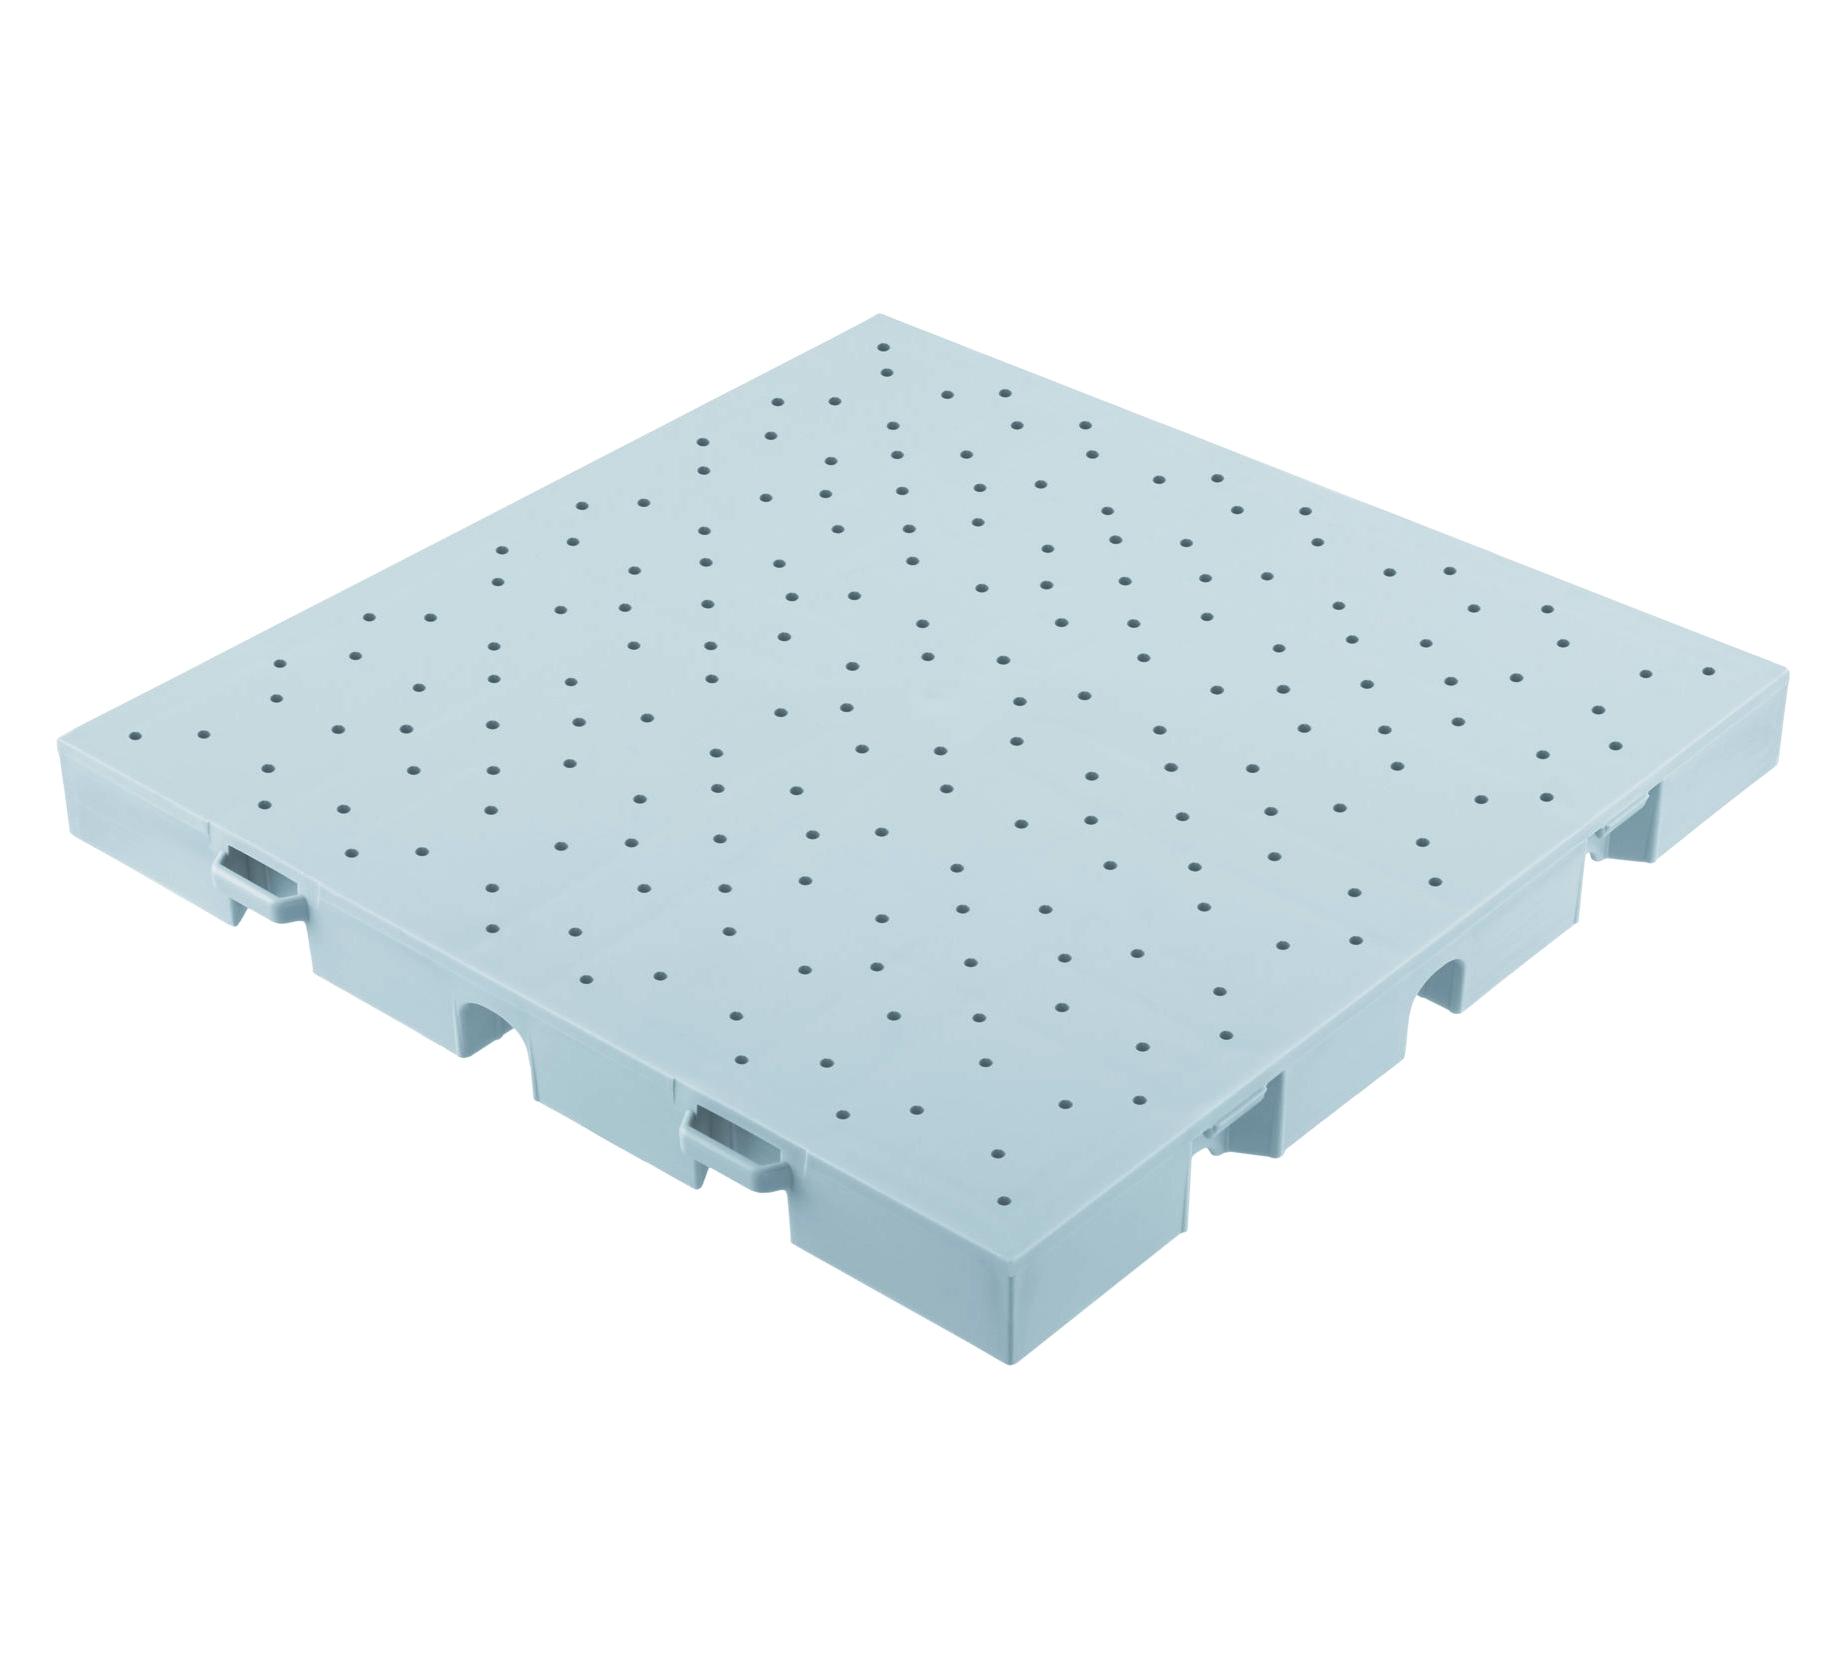 EBF1-DT Drainage Tile